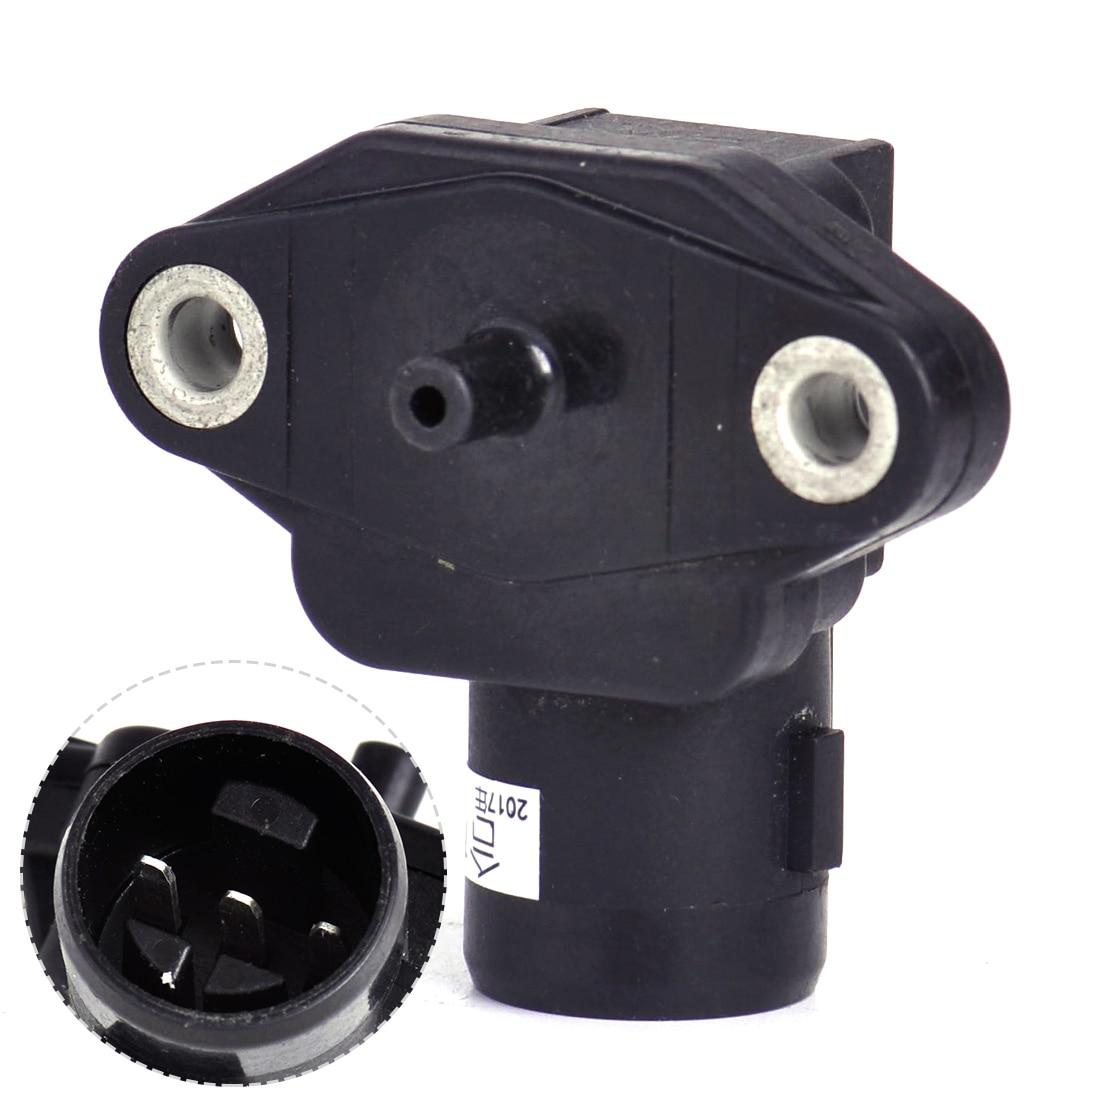 DWCX 3Pin Car Map Pressure Sensor TN079800-3280 / 079800-3280 37830PAAS00 for Acura Integra Honda Accord Civic CR-V 1997 - 1999